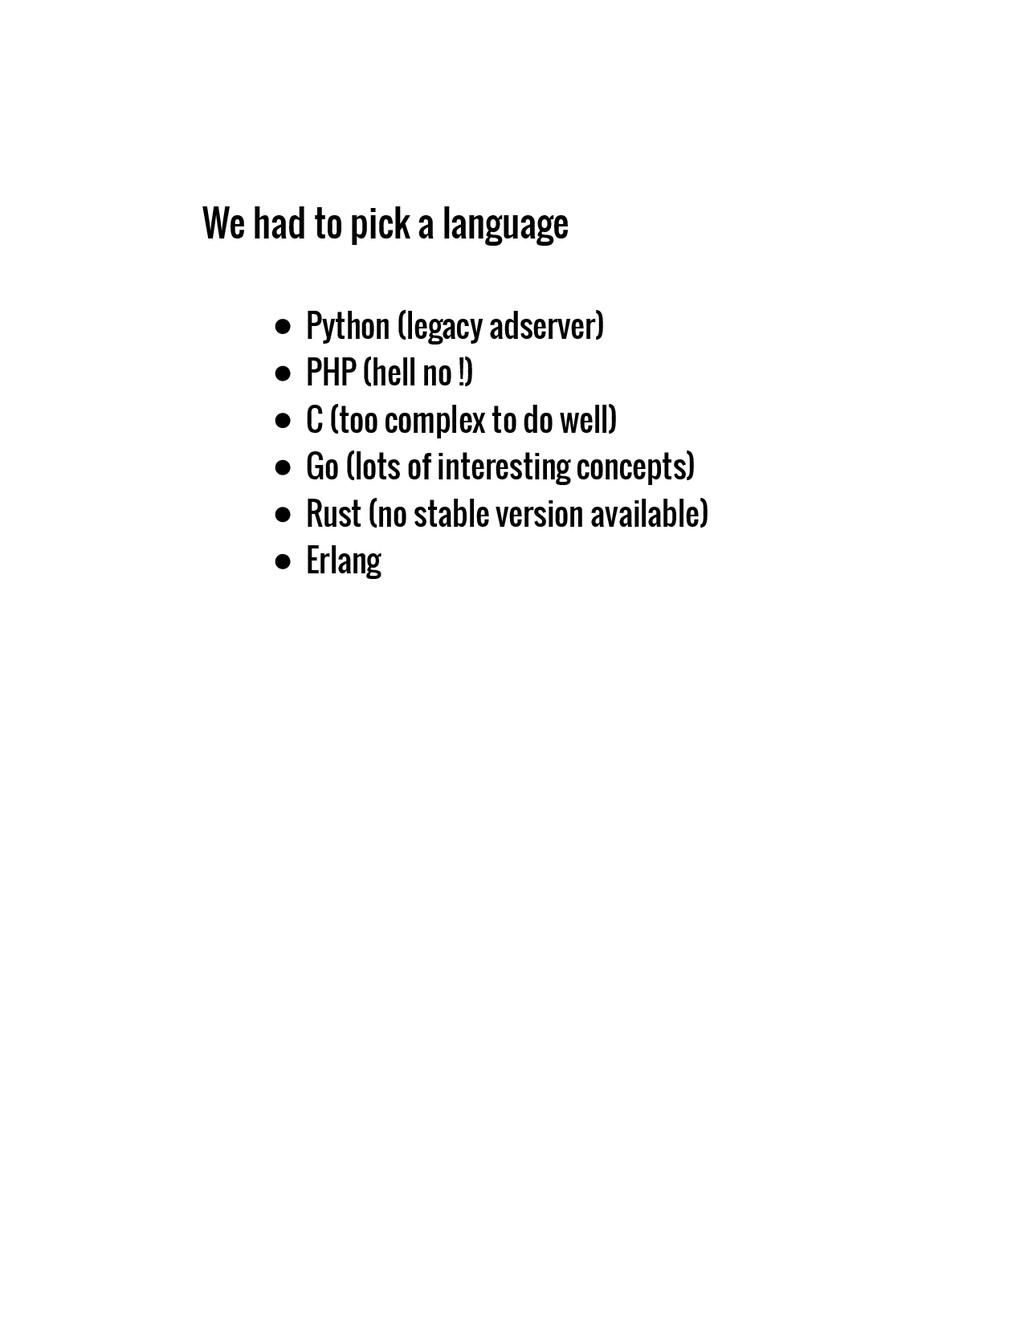 We had to pick a language Python (legacy adserv...